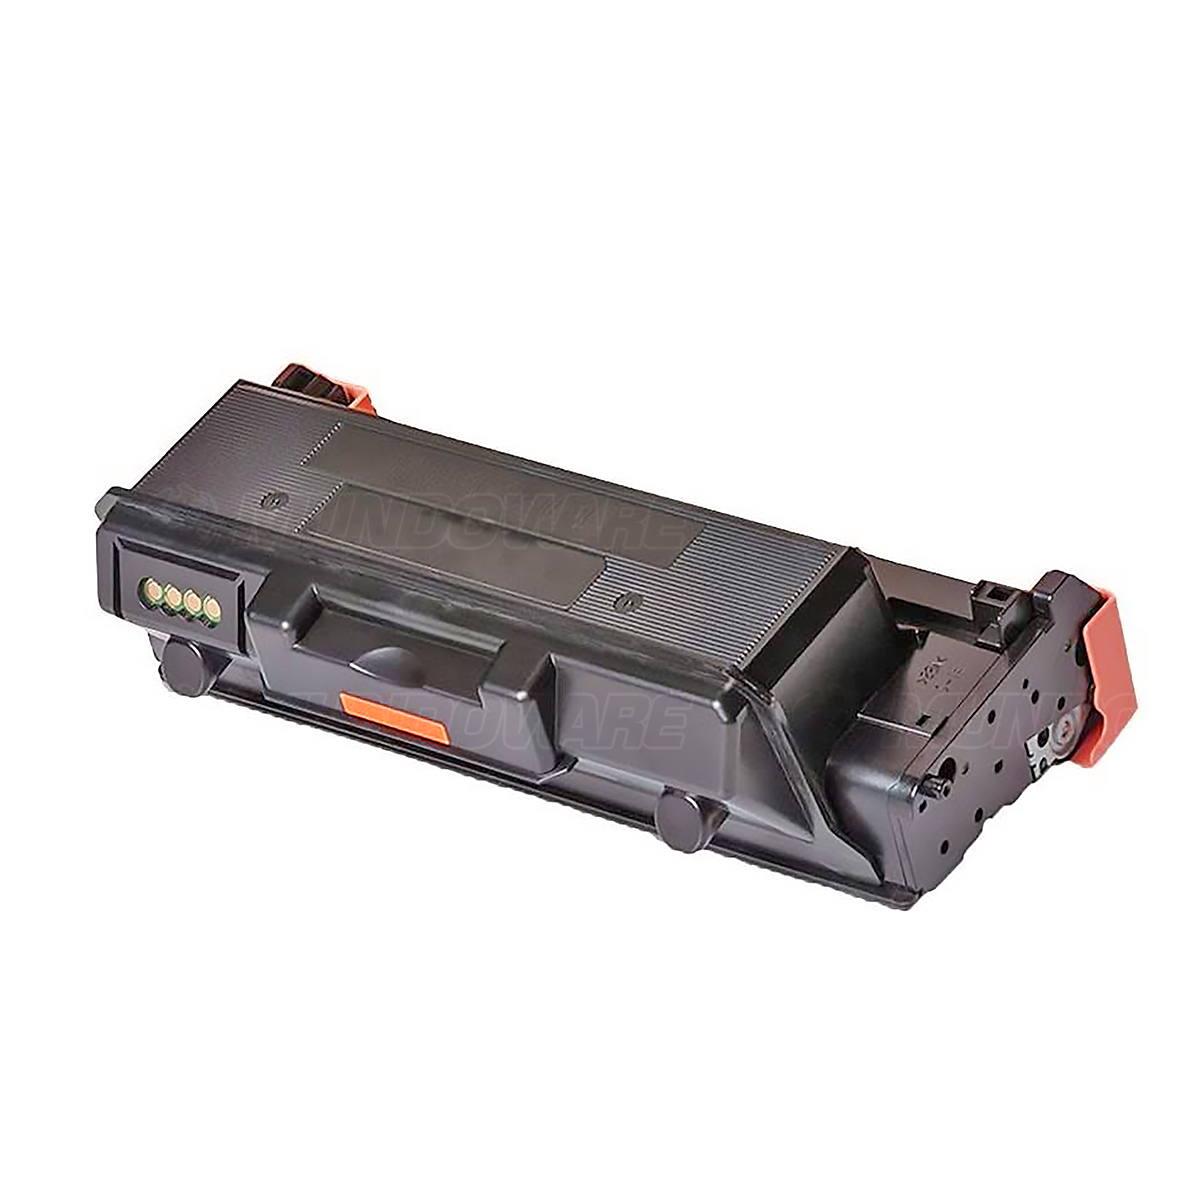 Compátivel: Toner para Impressora Xerox Phaser 3330 Workcentre 3335 3345 Preto 15.000